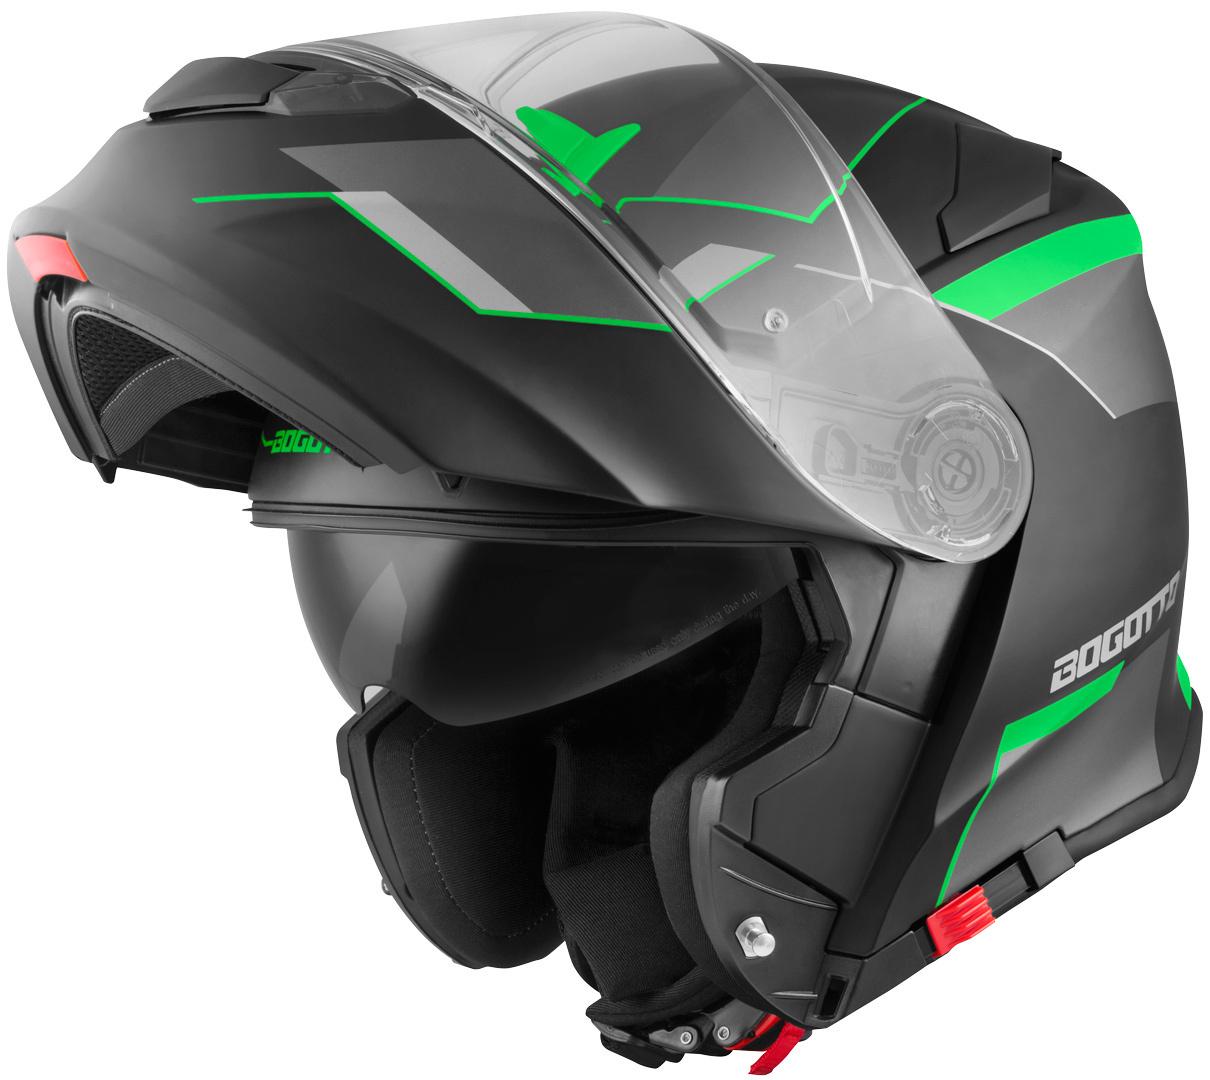 Bogotto V271 Delta Klapphelm, schwarz-grün, Größe 2XL, schwarz-grün, Größe 2XL